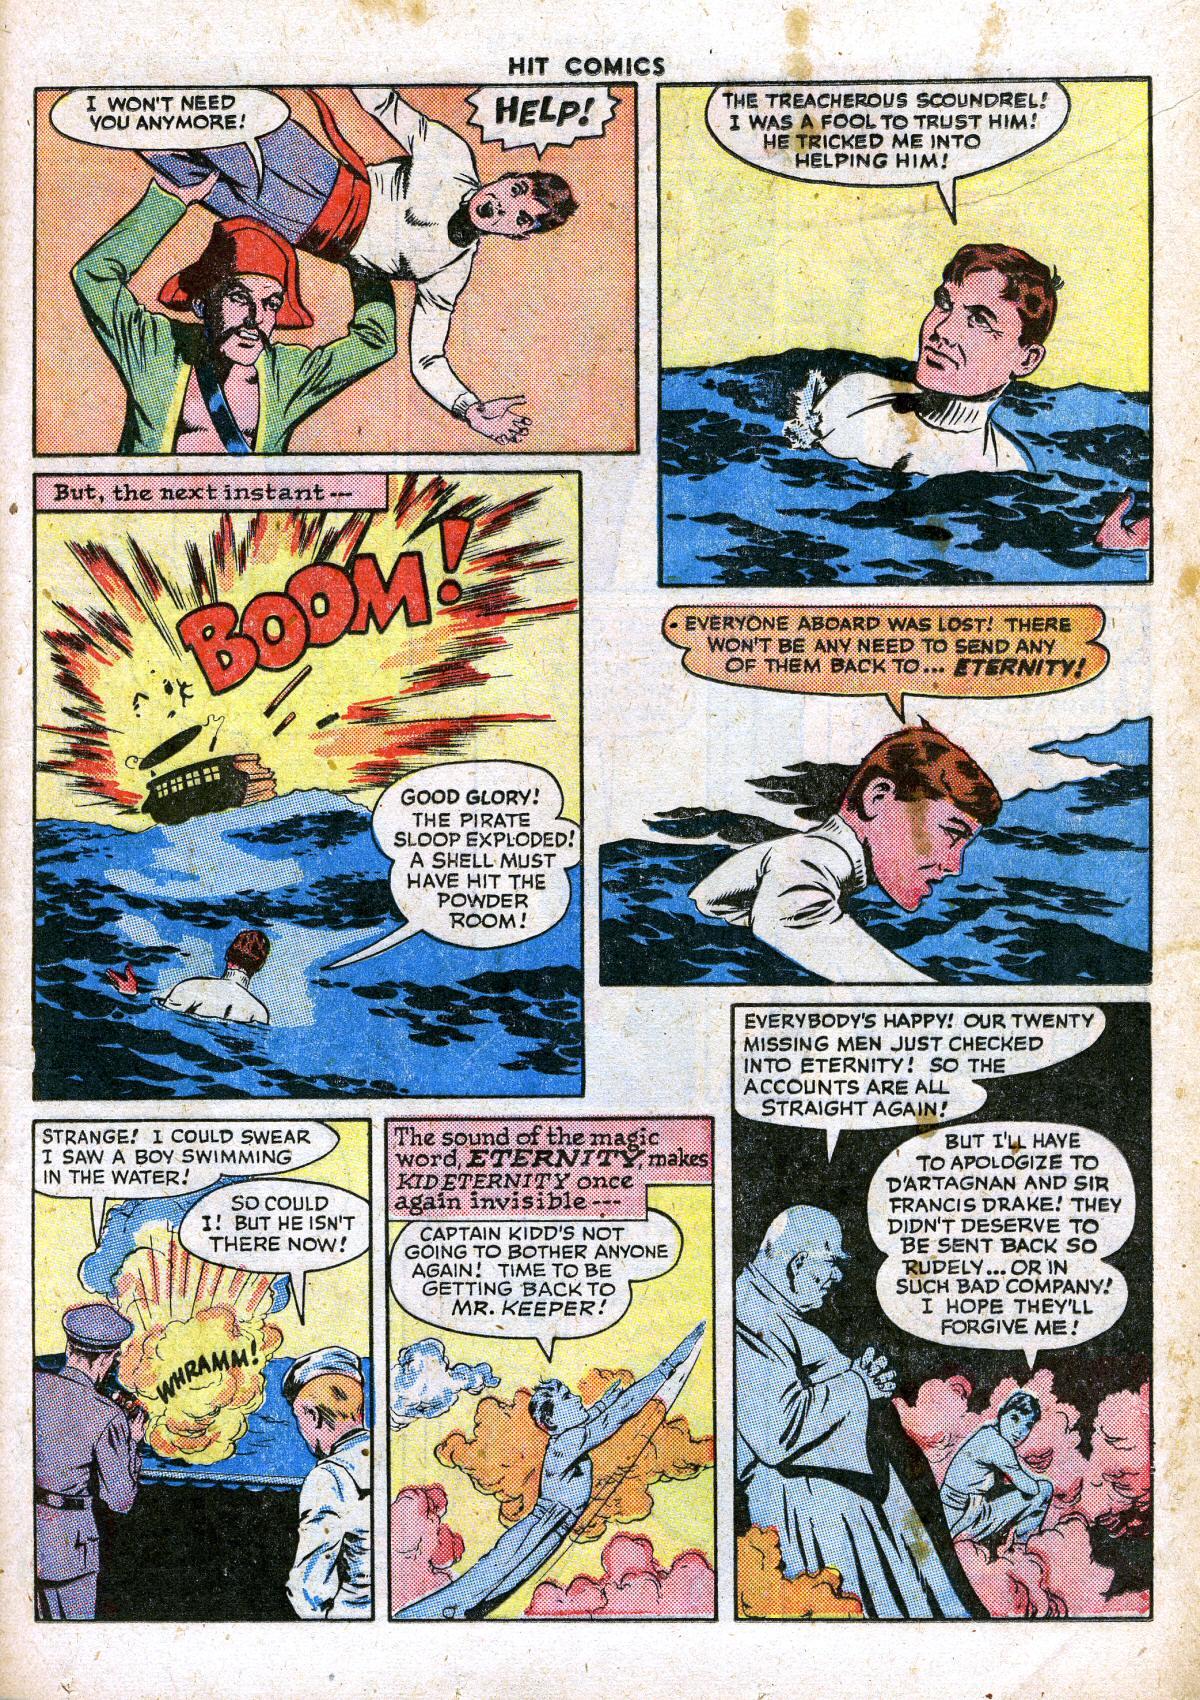 Read online Hit Comics comic -  Issue #41 - 17